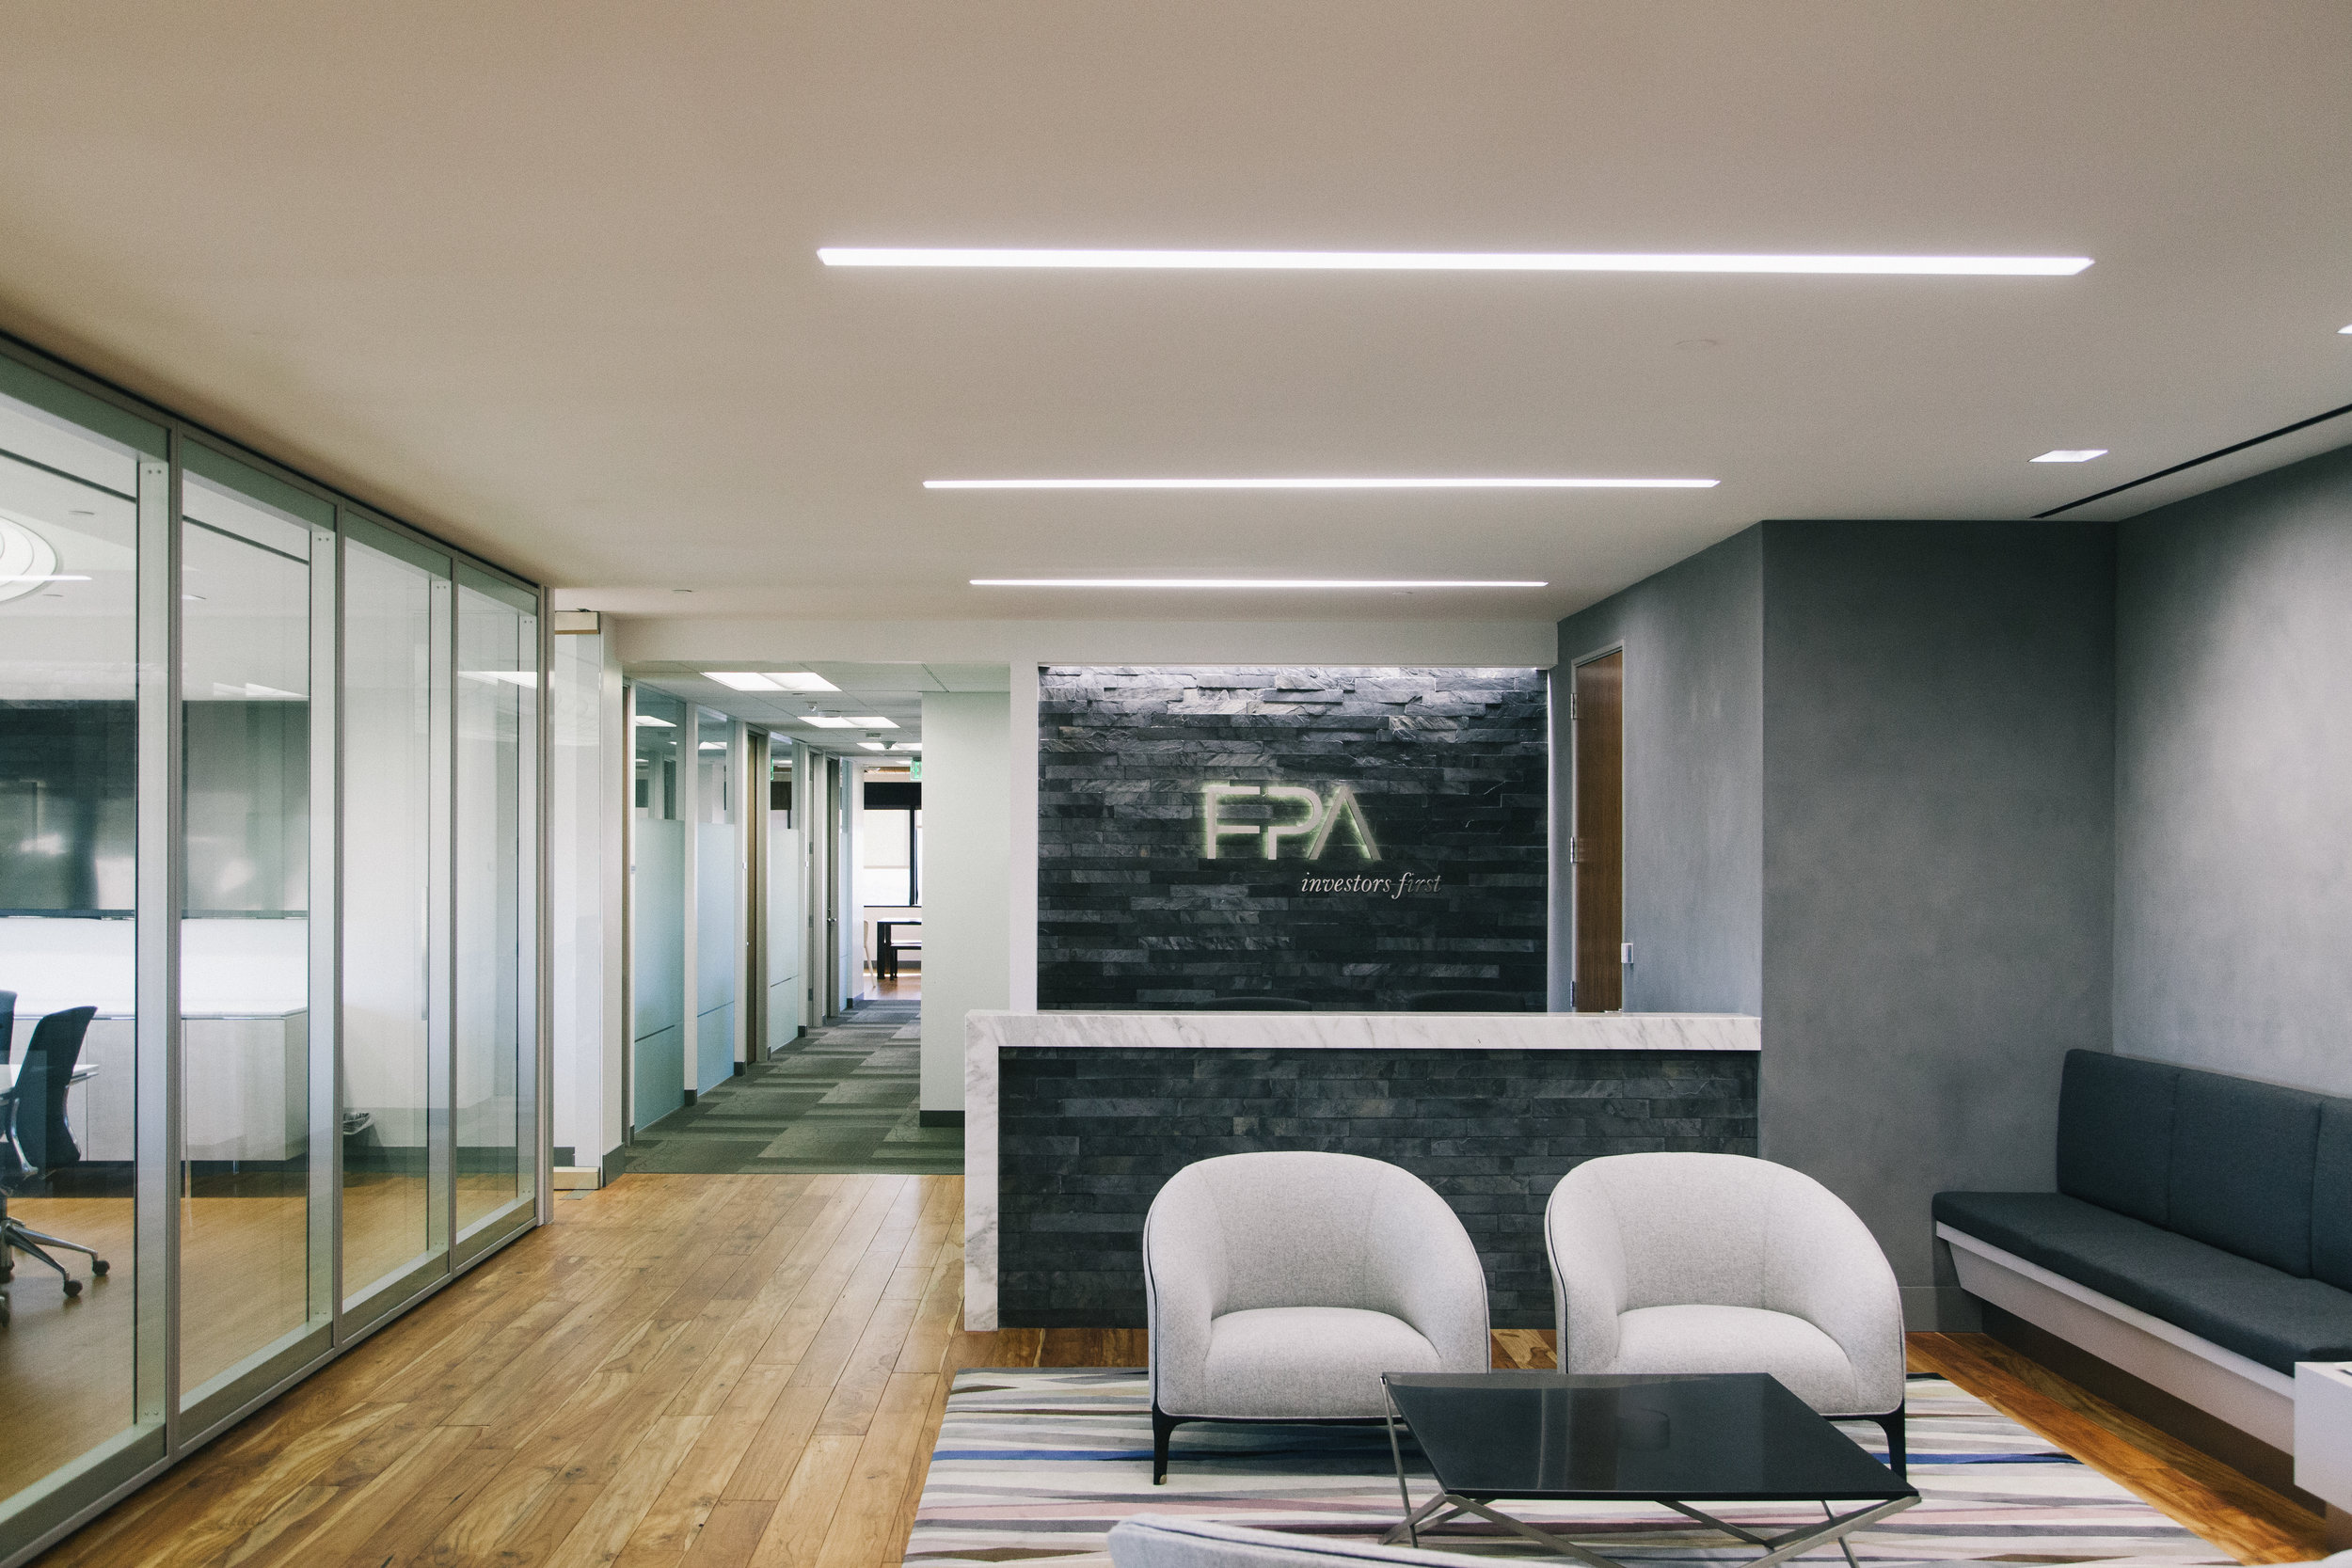 S.E.A.-Studio-Environmental-Architecture-David-Hertz-FAIA-First-Pacific-Advisors-Los-Angeles-tenant-improvement-sustainable-regenerative-restorative-green-design-office-sleek-modern-interior-Westside-commercial-building-professional-workplace-1.jpg